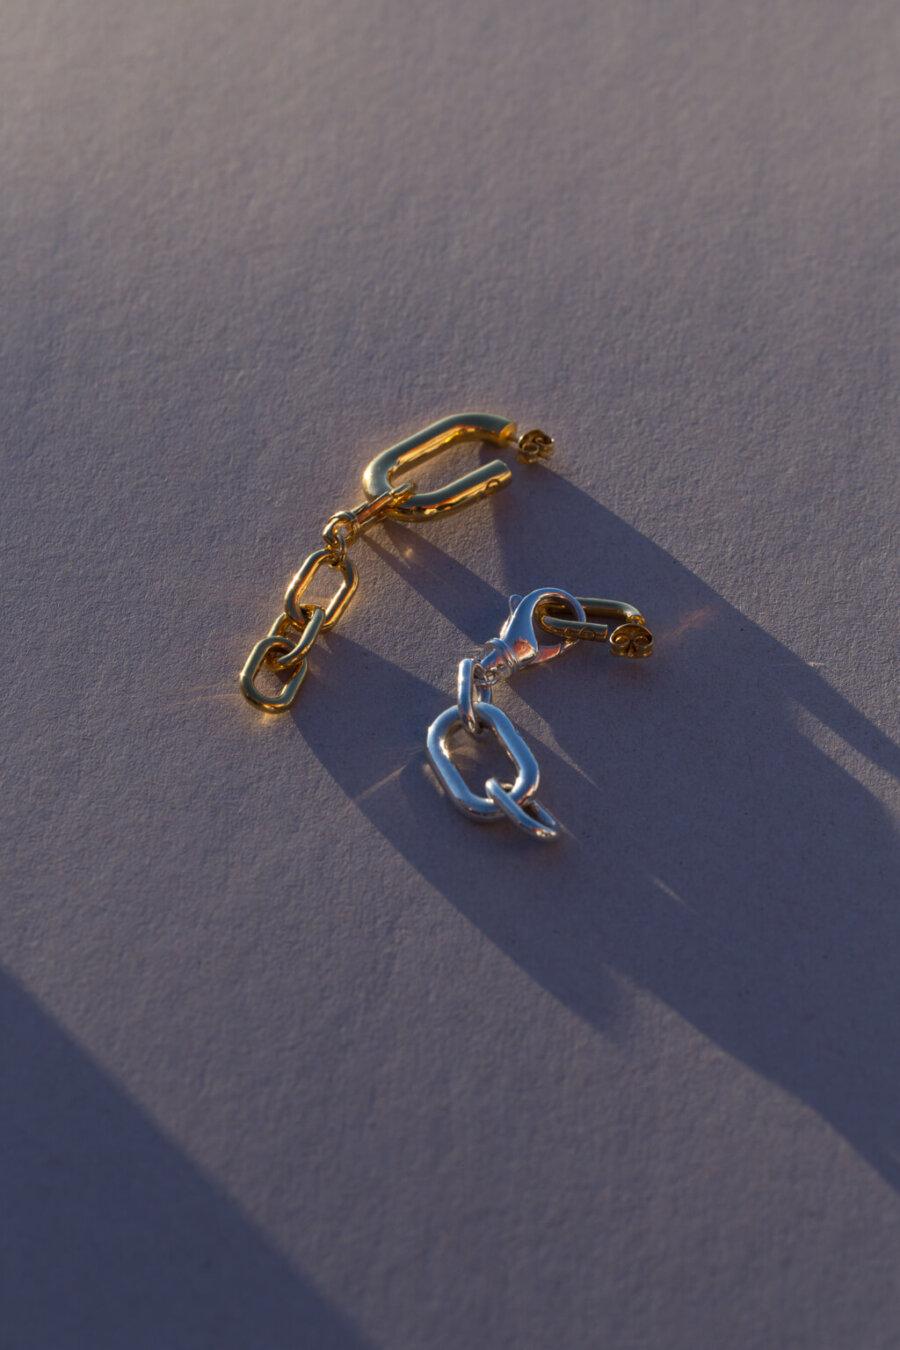 the-small-golden-links-by-glenda-lopez-alta